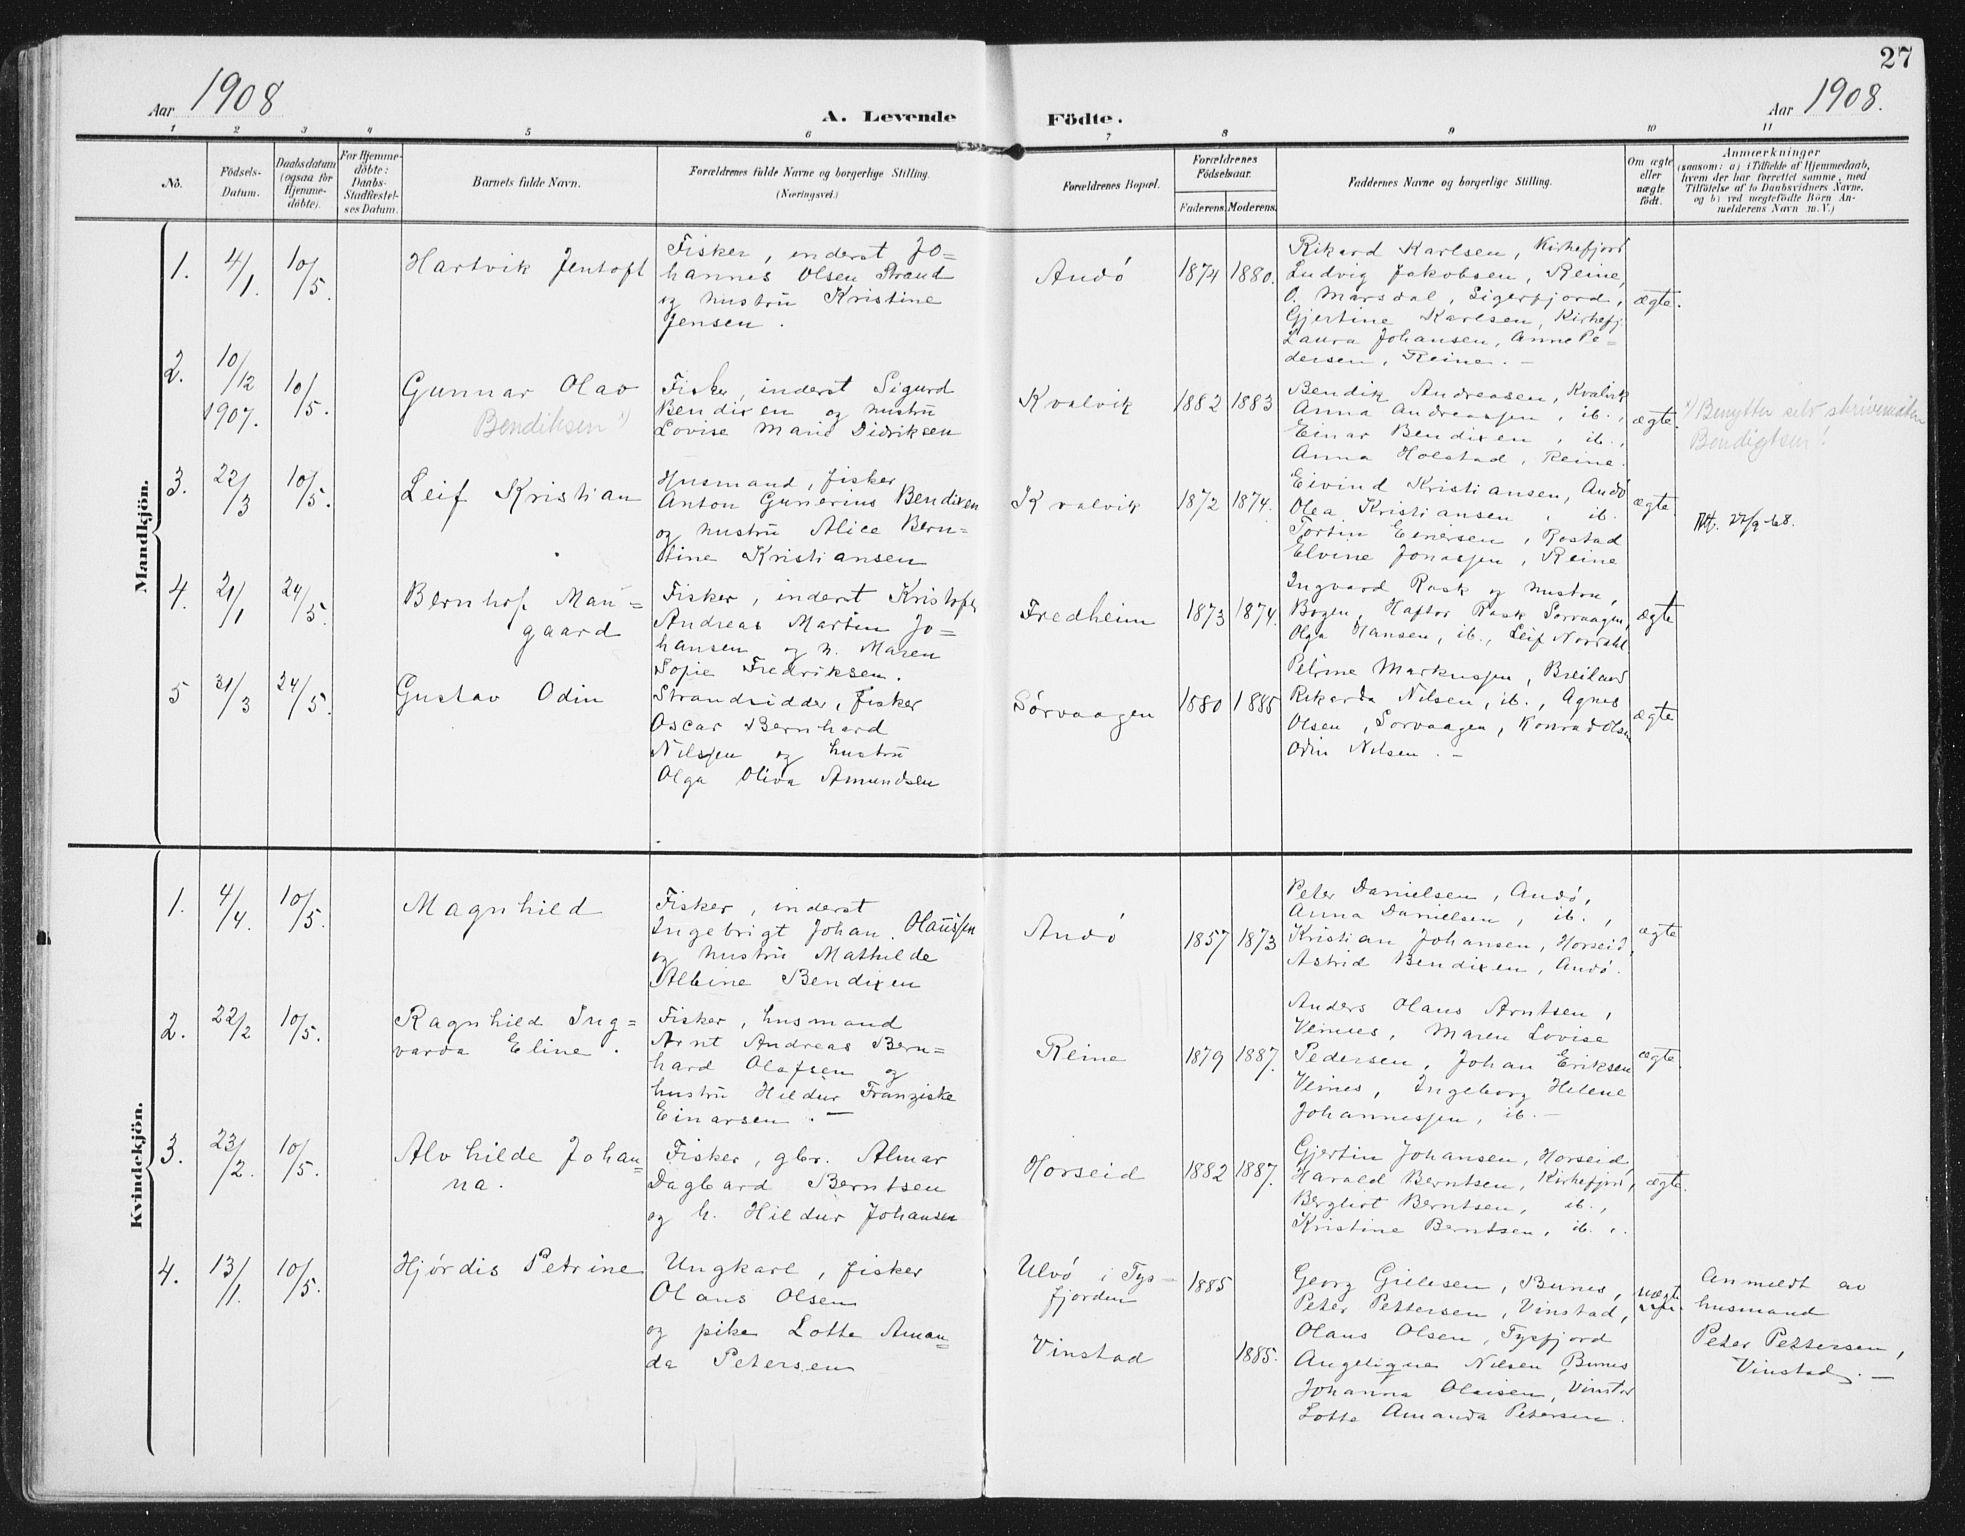 SAT, Ministerialprotokoller, klokkerbøker og fødselsregistre - Nordland, 886/L1221: Ministerialbok nr. 886A03, 1903-1913, s. 27